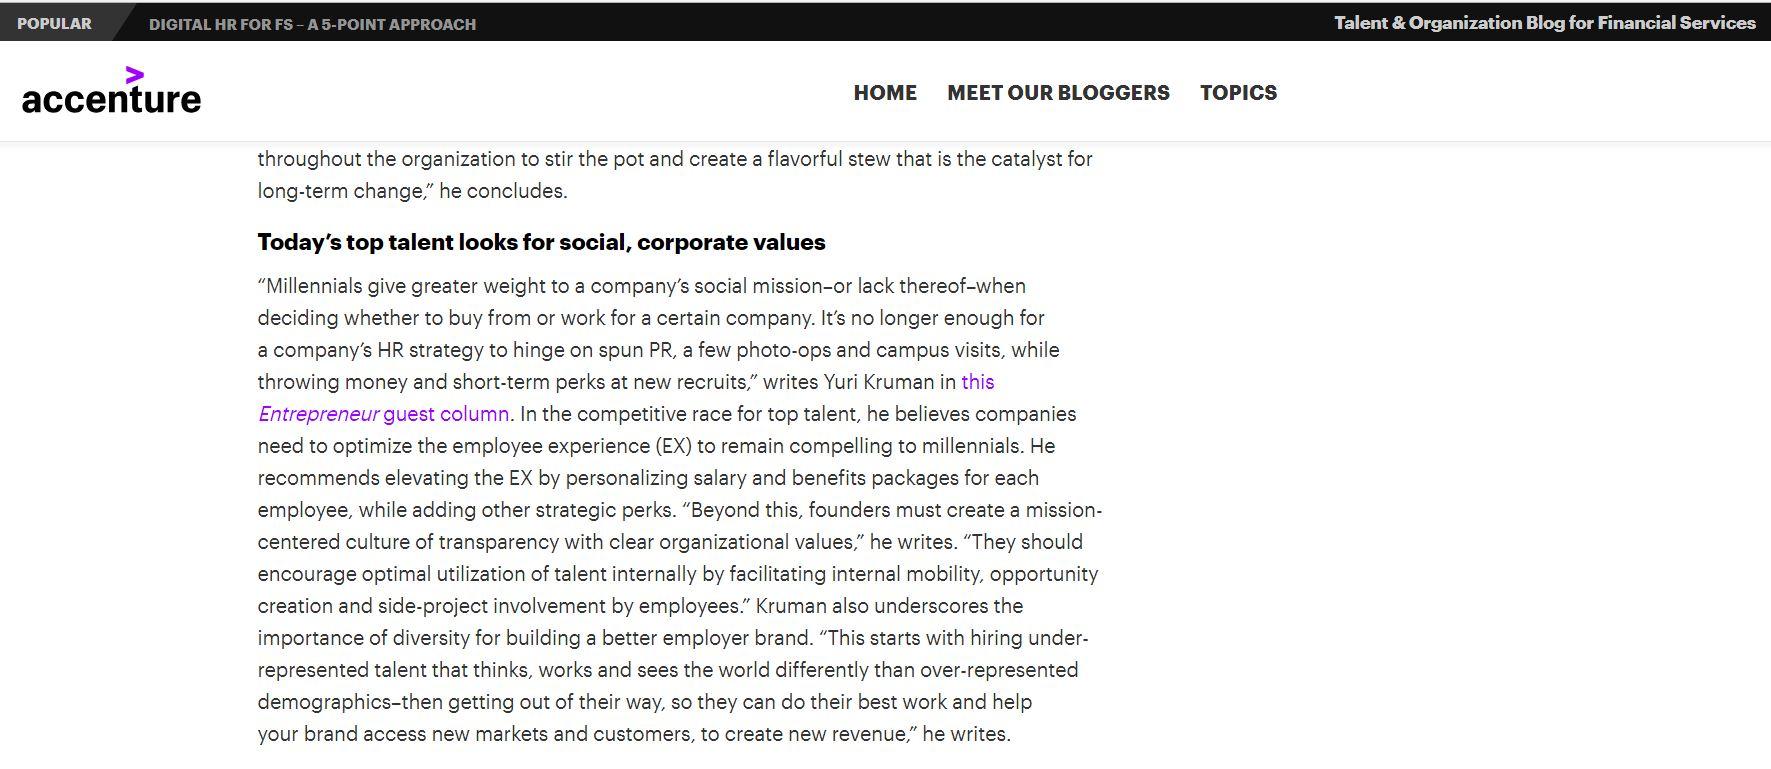 Accenture's Talent & Organizationa Blog Shout-Out.JPG